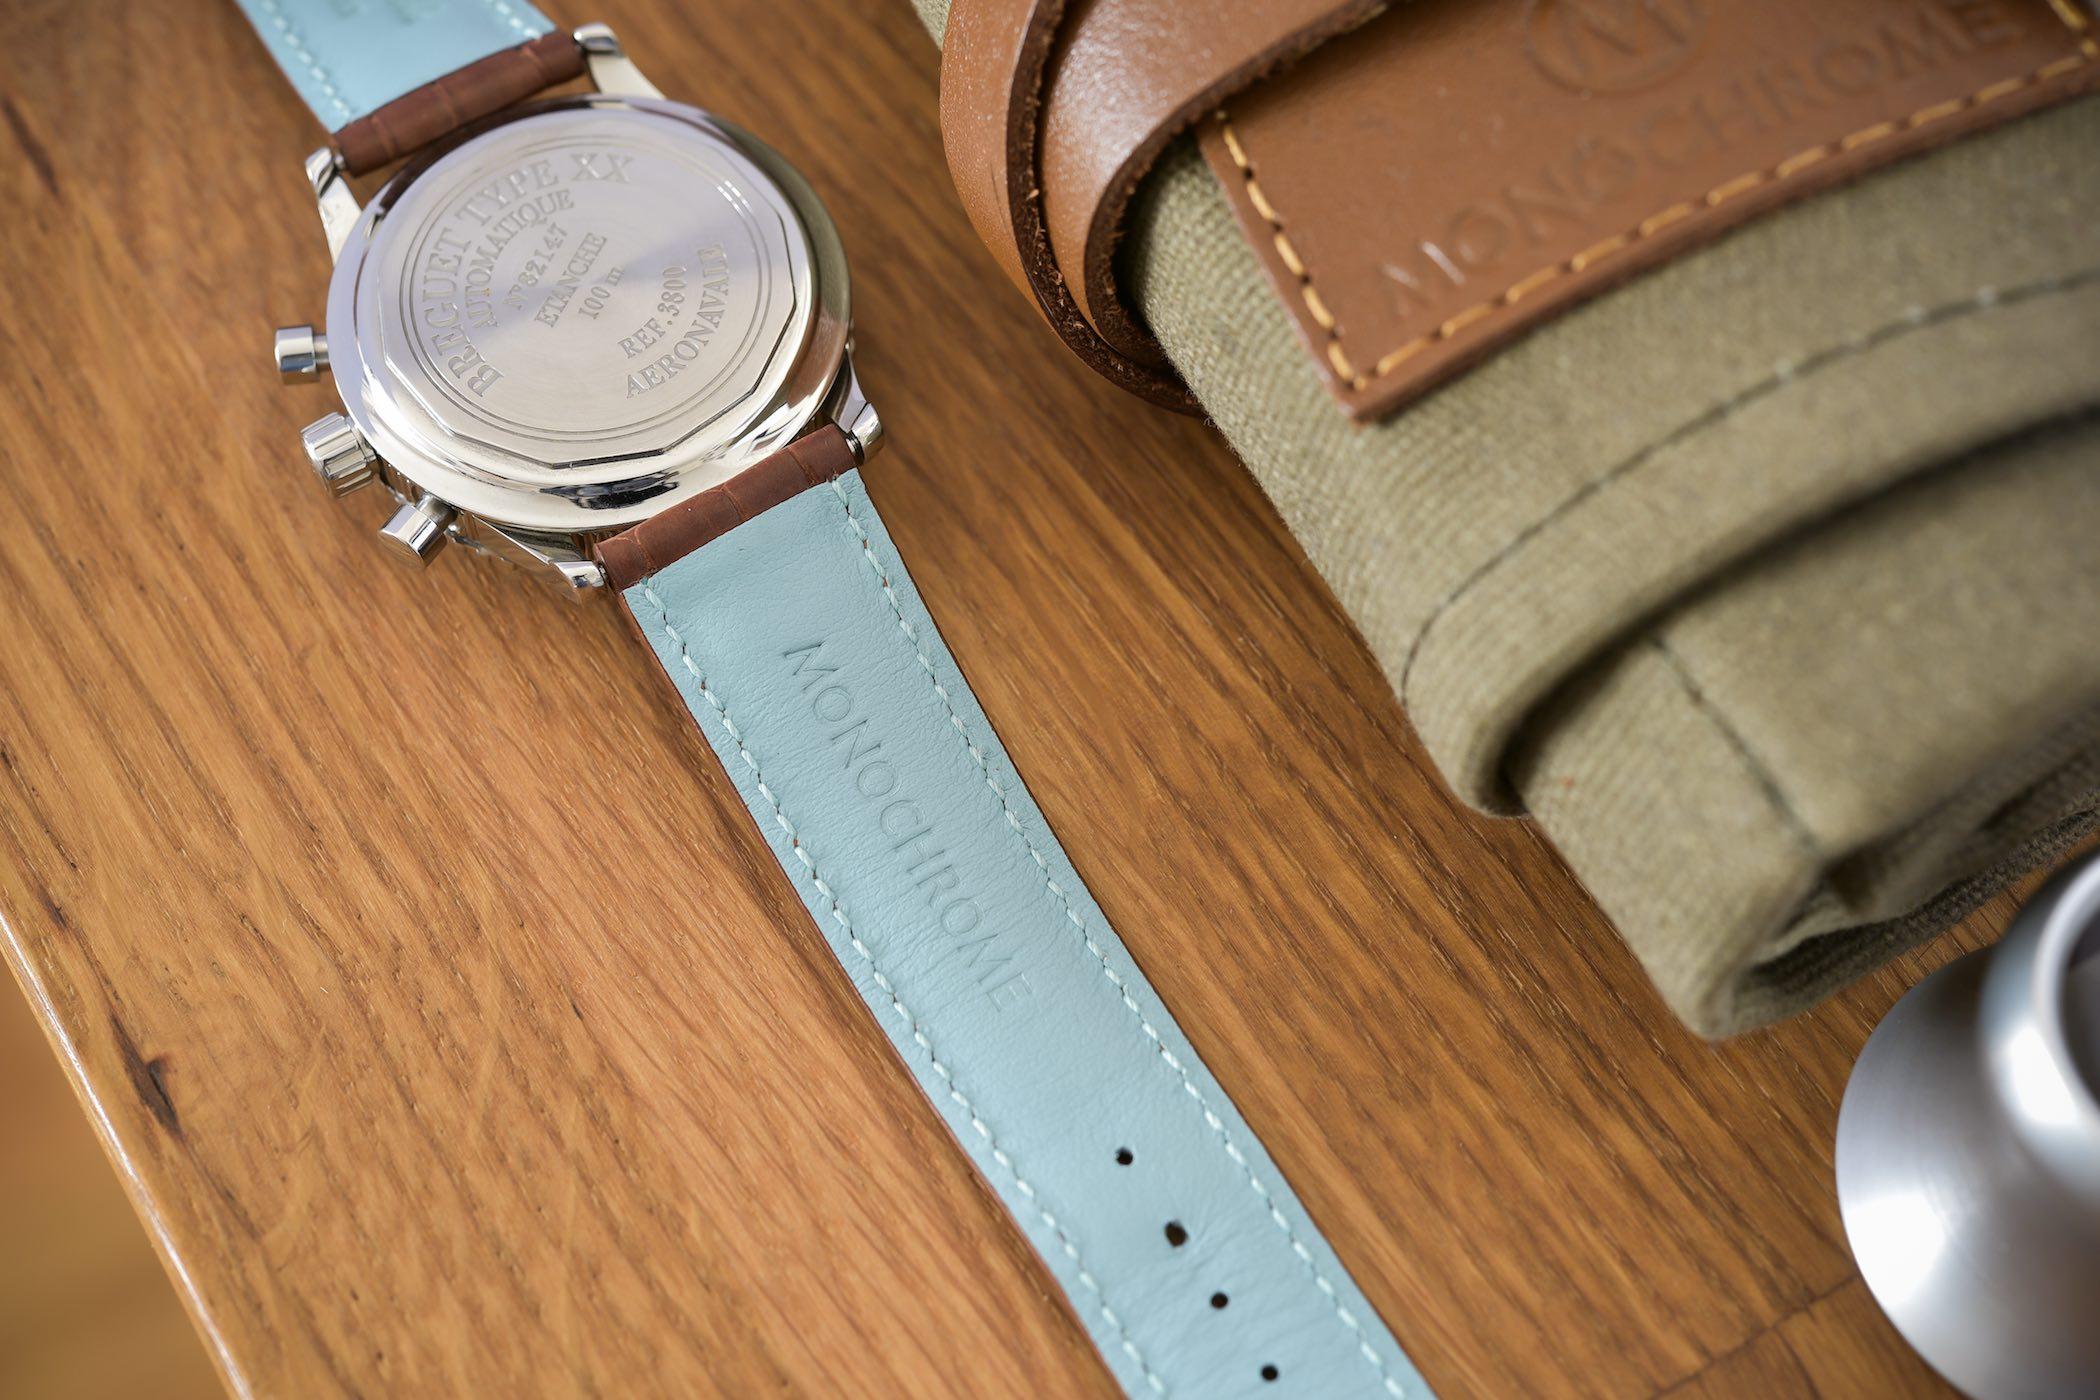 New MONOCHROME Shop - Leather Straps, Watch Rolls, Watch Accessories